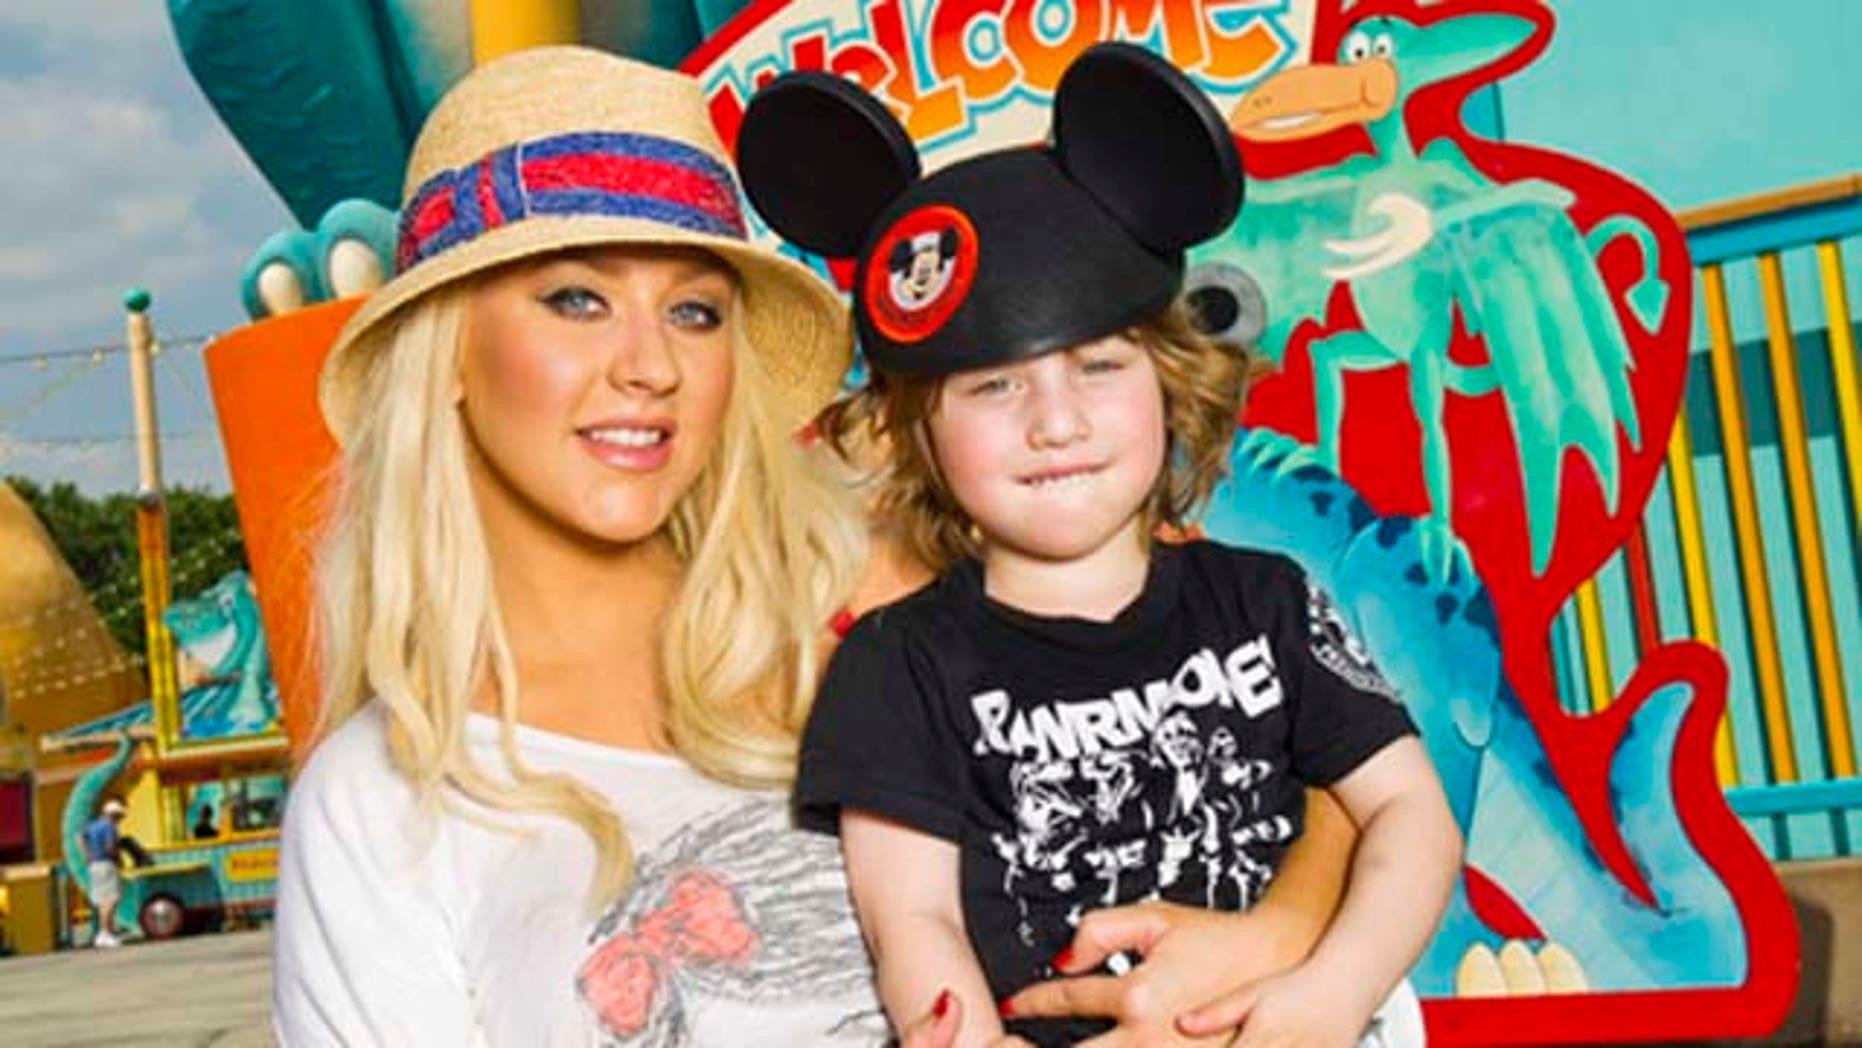 April 11, 2011: SInger Christina Aguilera poses with her son Max at Disney's Animal Kingdom theme park at Walt Disney World Resort in Lake Buena Vista, Fla.